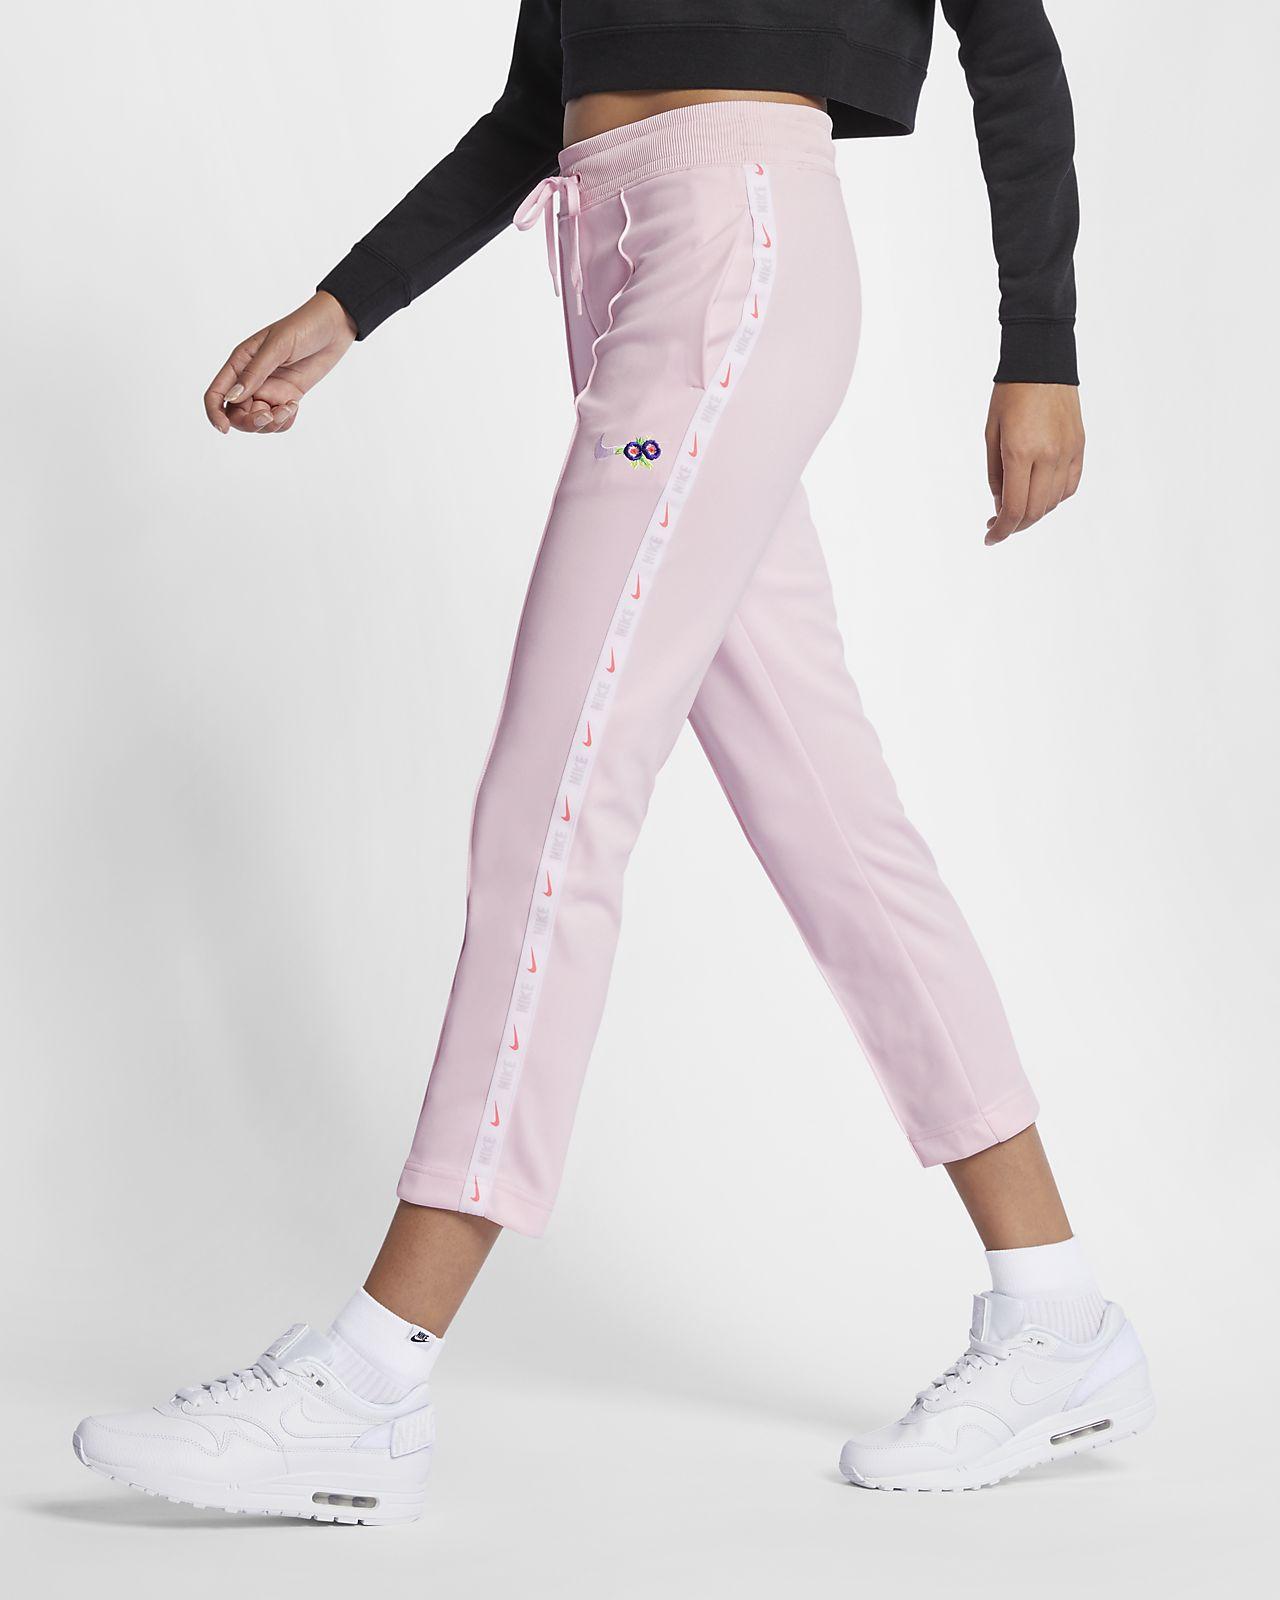 Pantalon Nike FR Sportswear pour Femme Cqp7q60wx 276d12fcff1